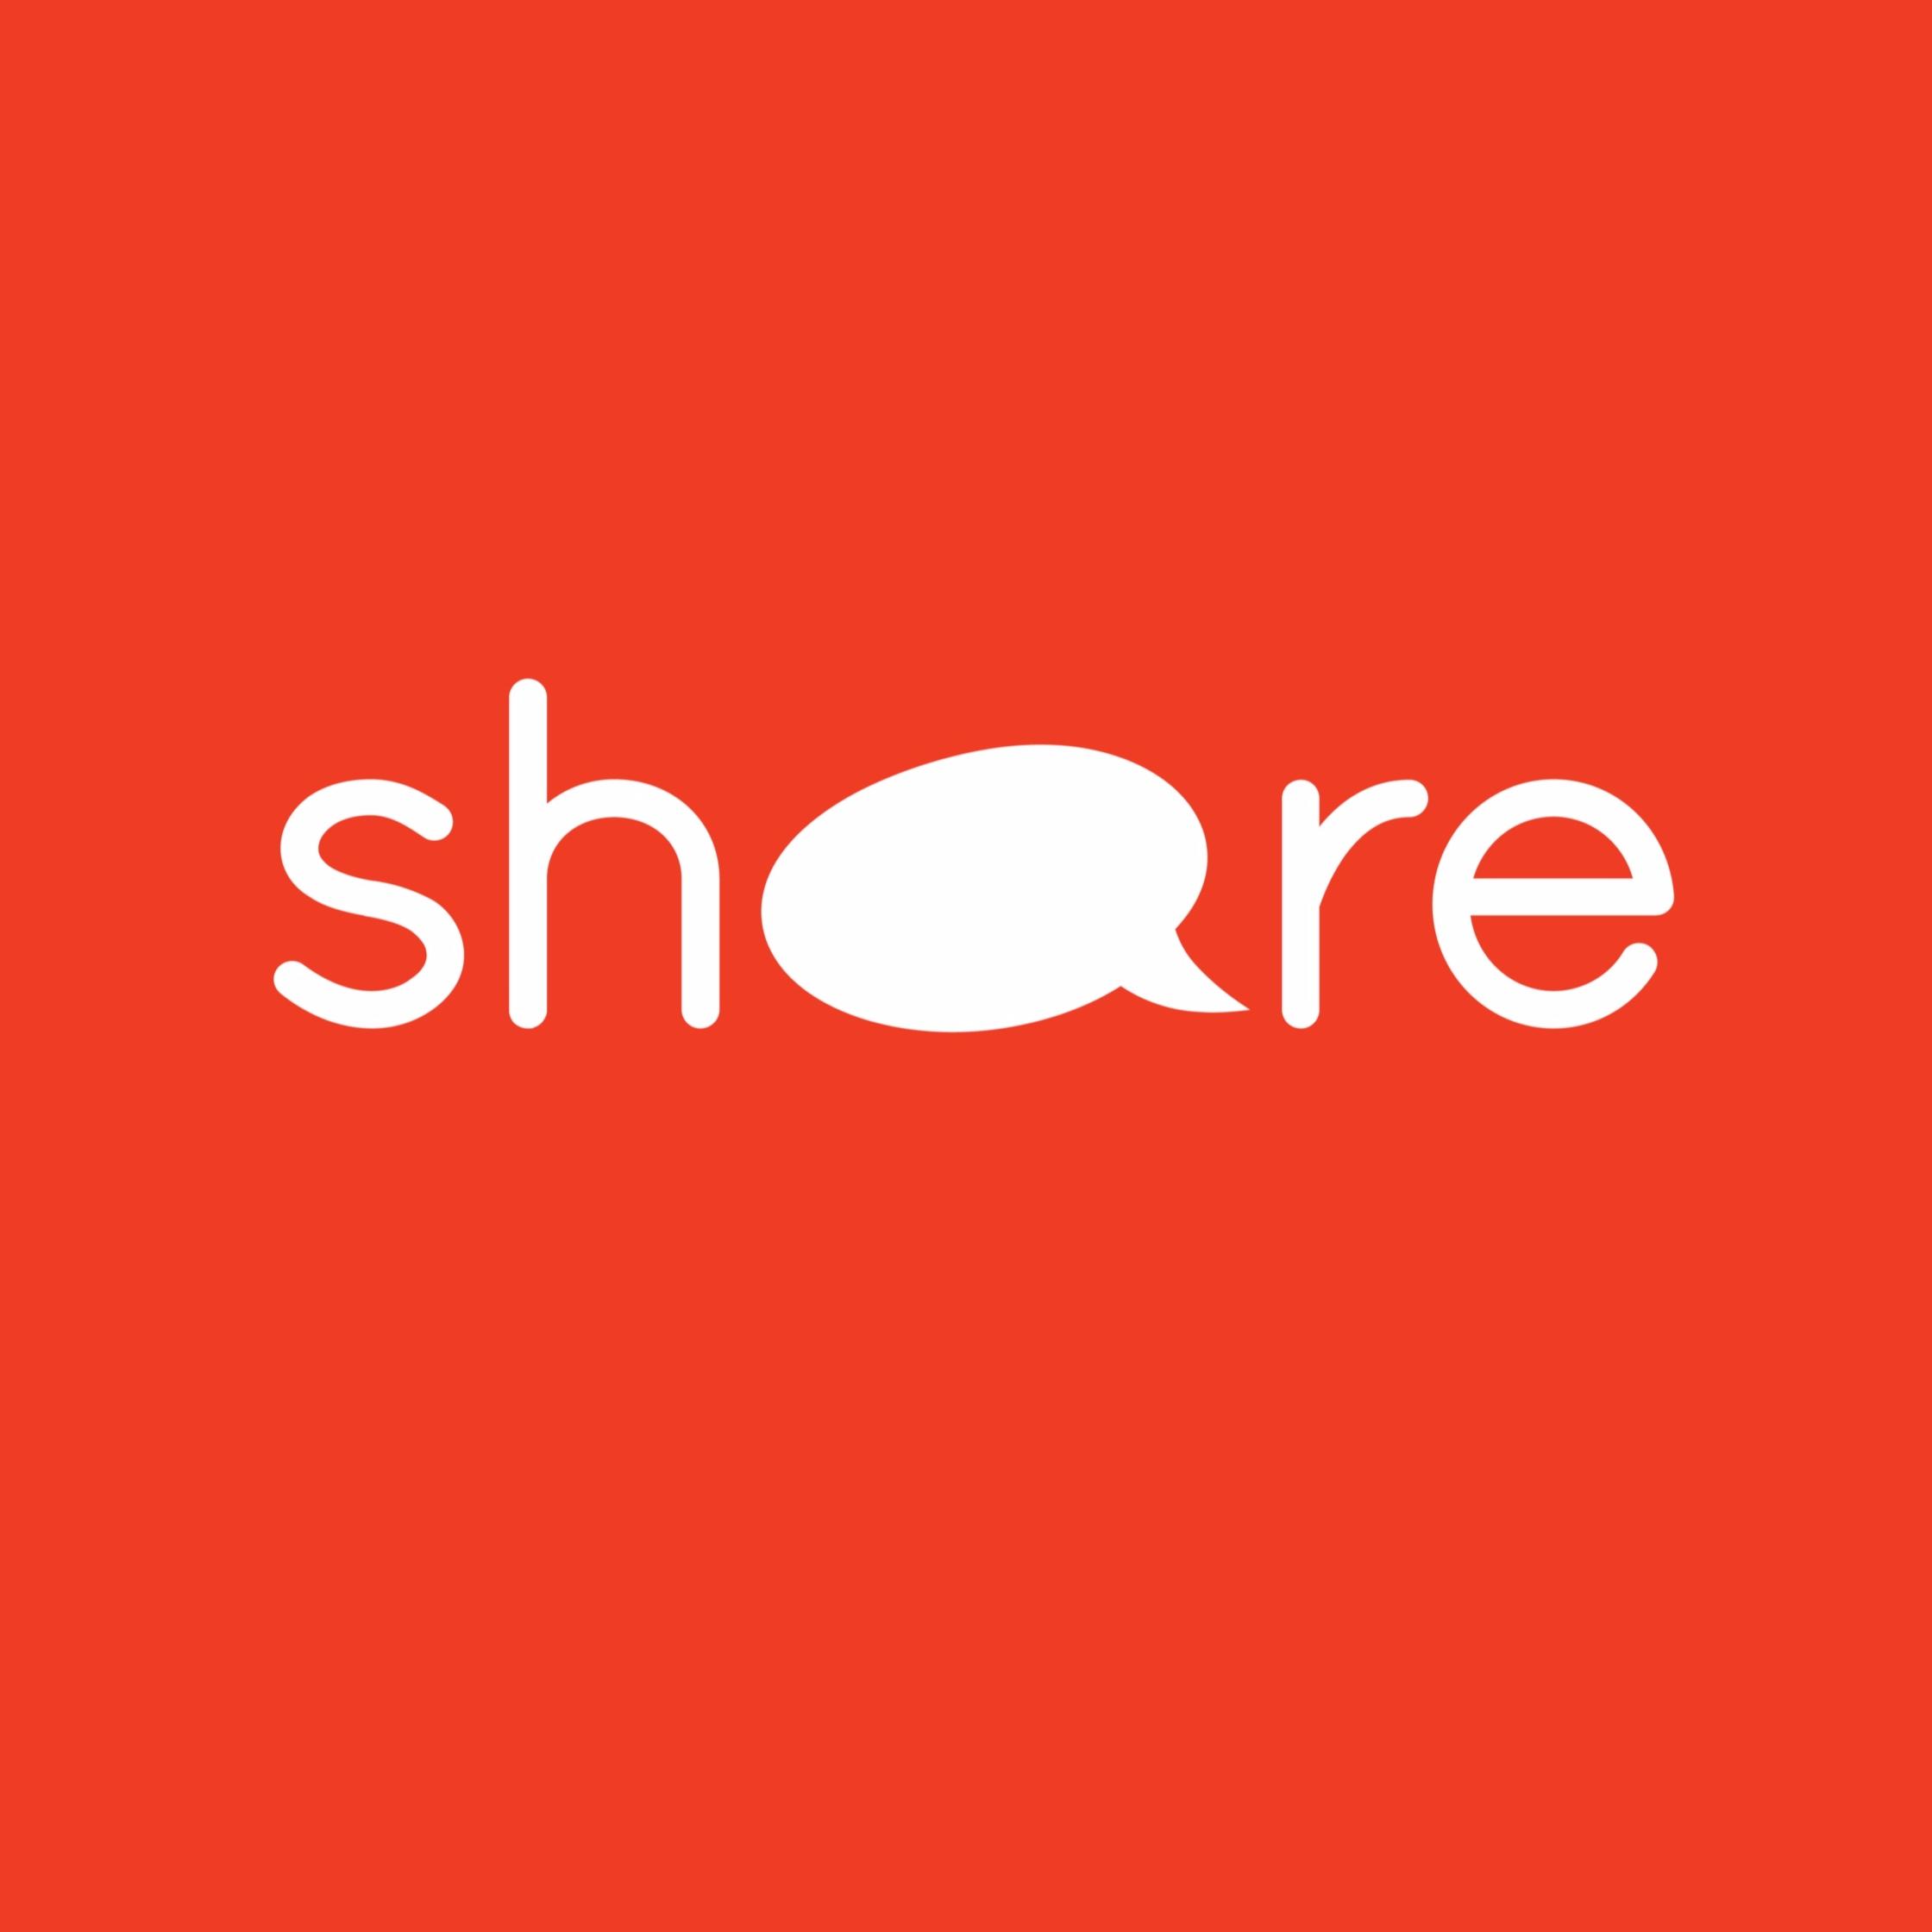 ShareIGArtboard%2B1%25404x.jpg